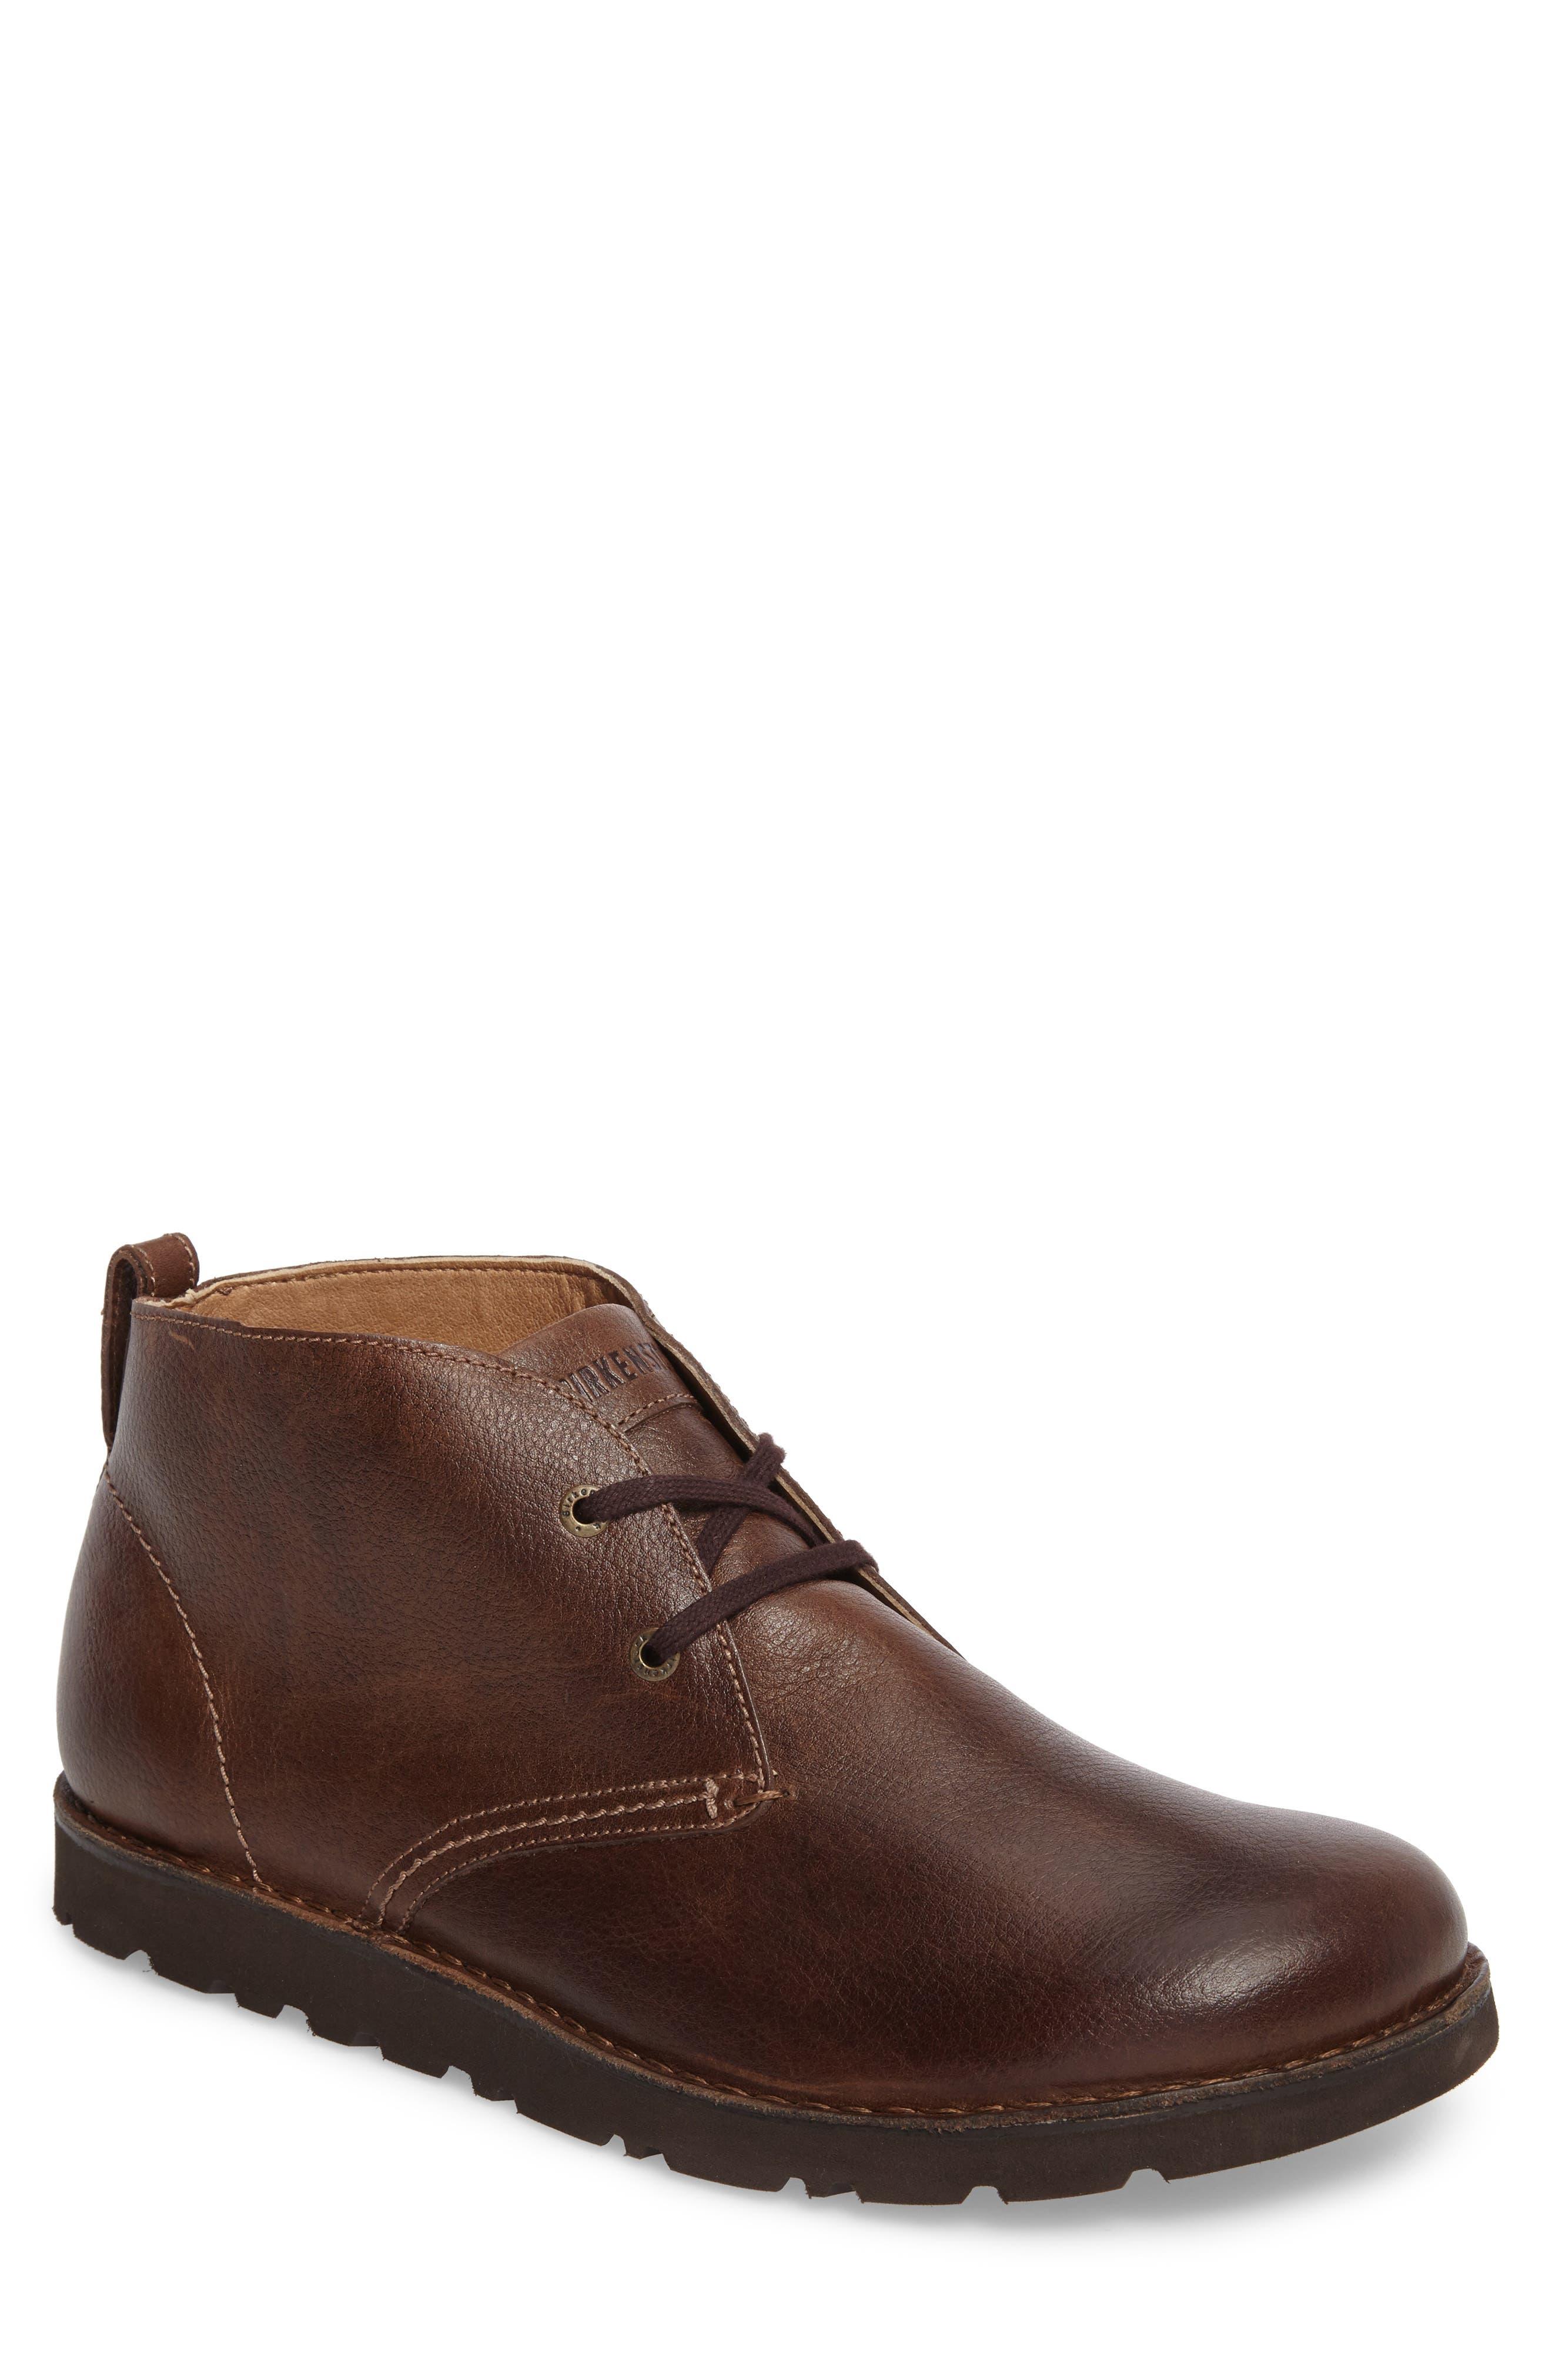 Main Image - Birkenstock 'Harris' Chukka Boot (Men)